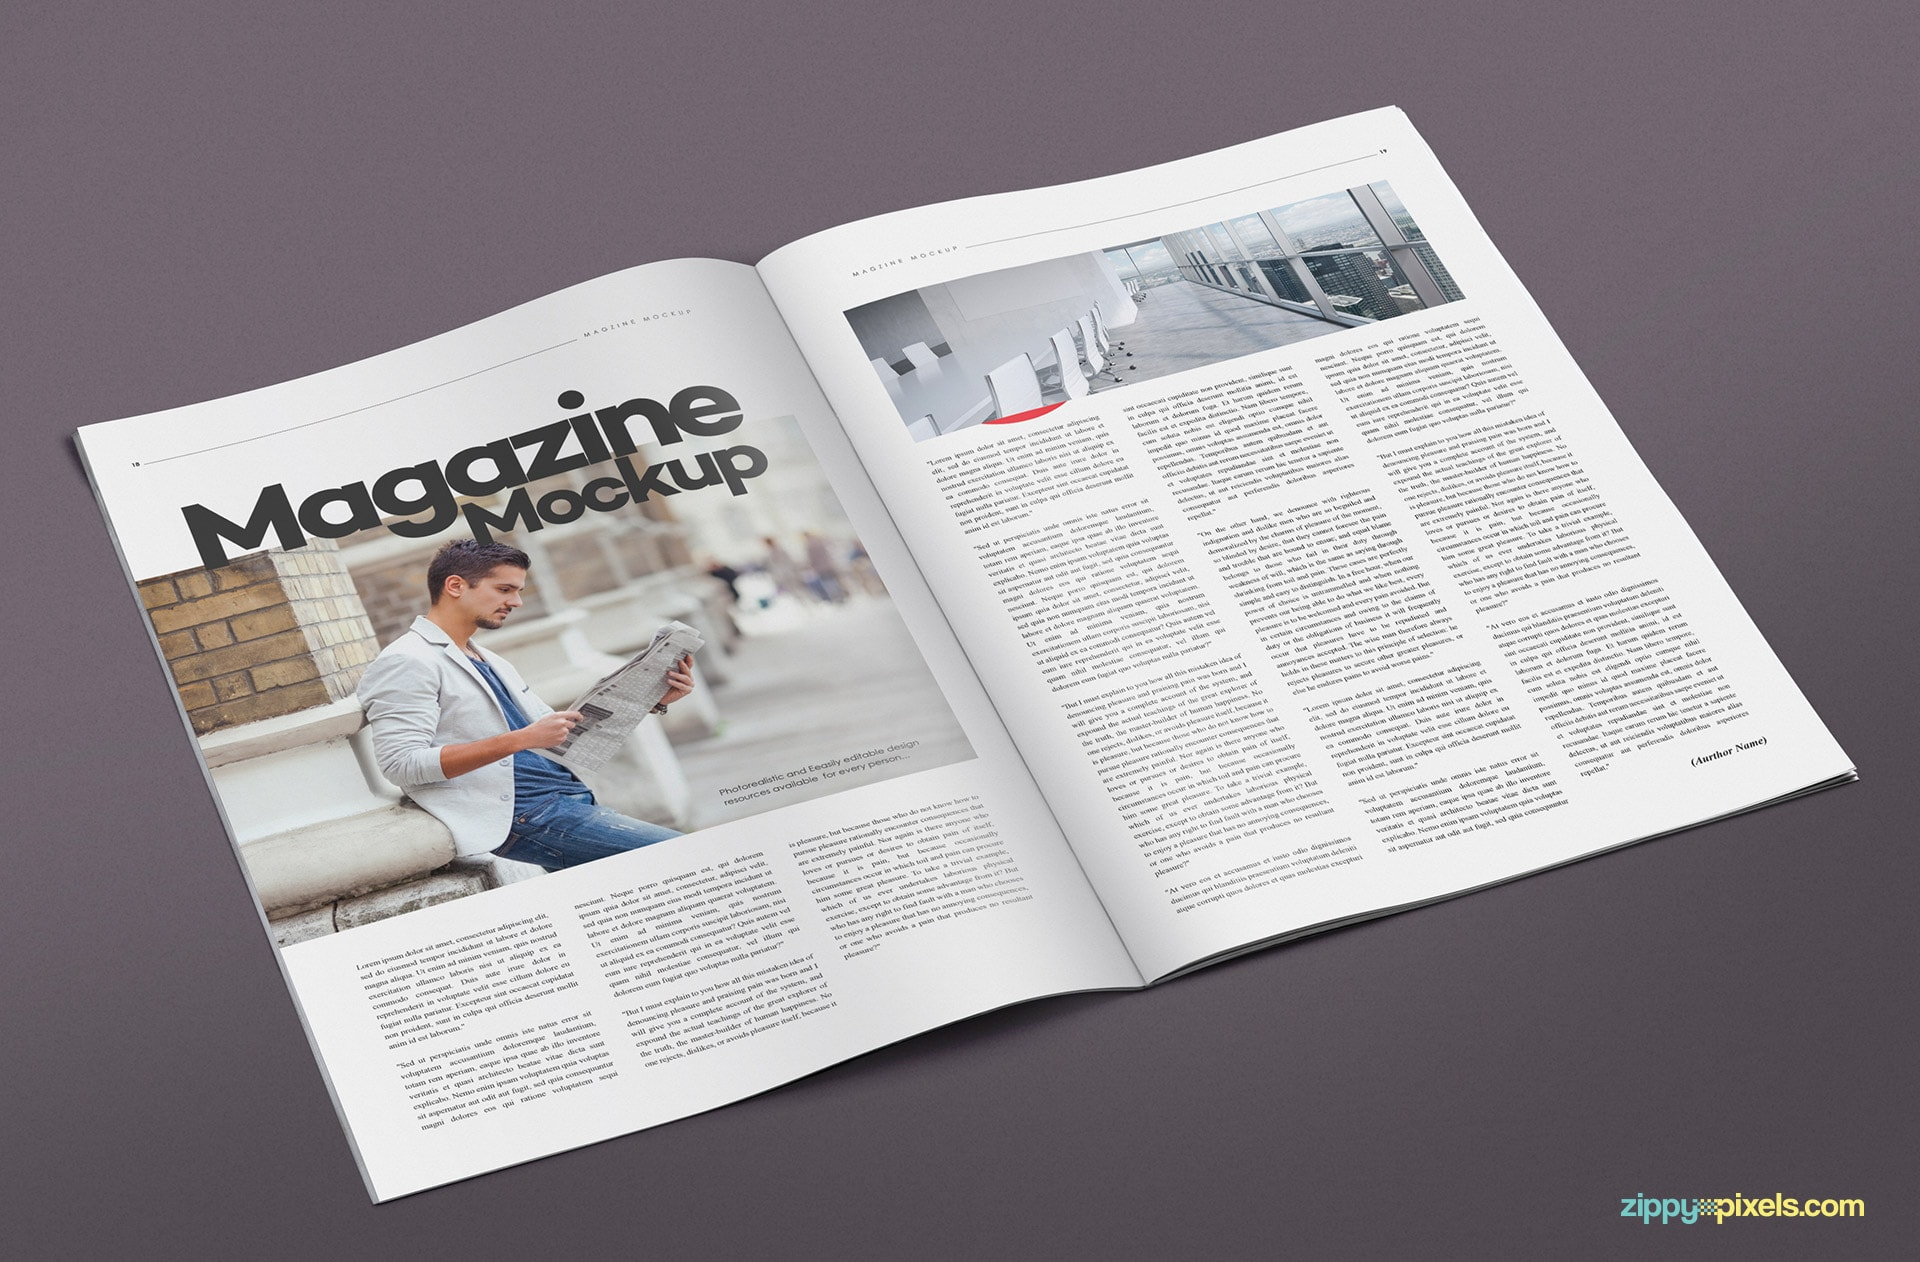 A set of 14 bifold magazine mock ups